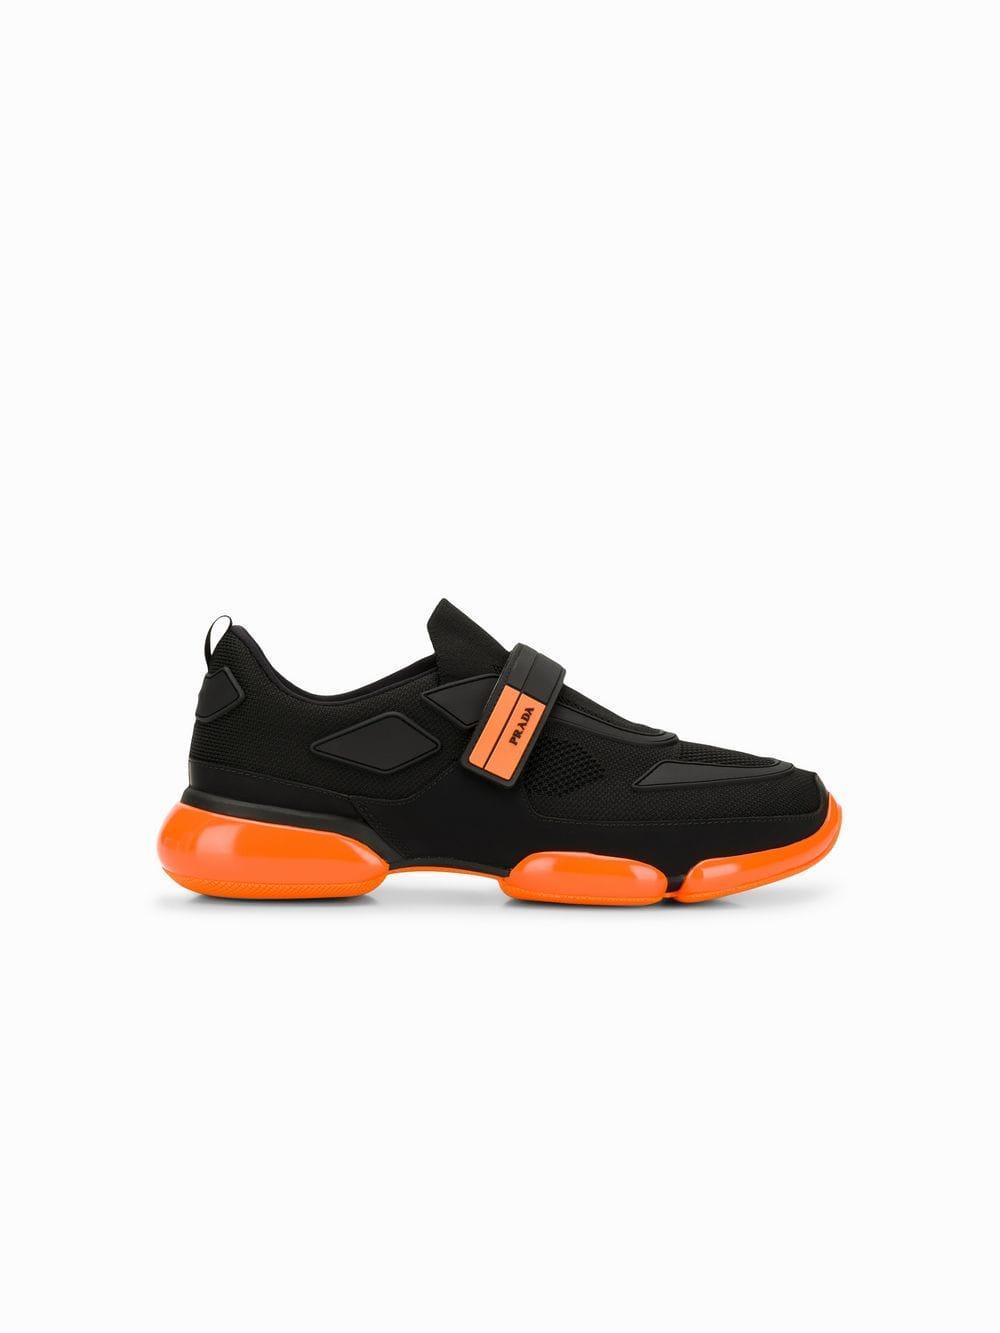 Orange Cloudbust Sole Detail Sneakers